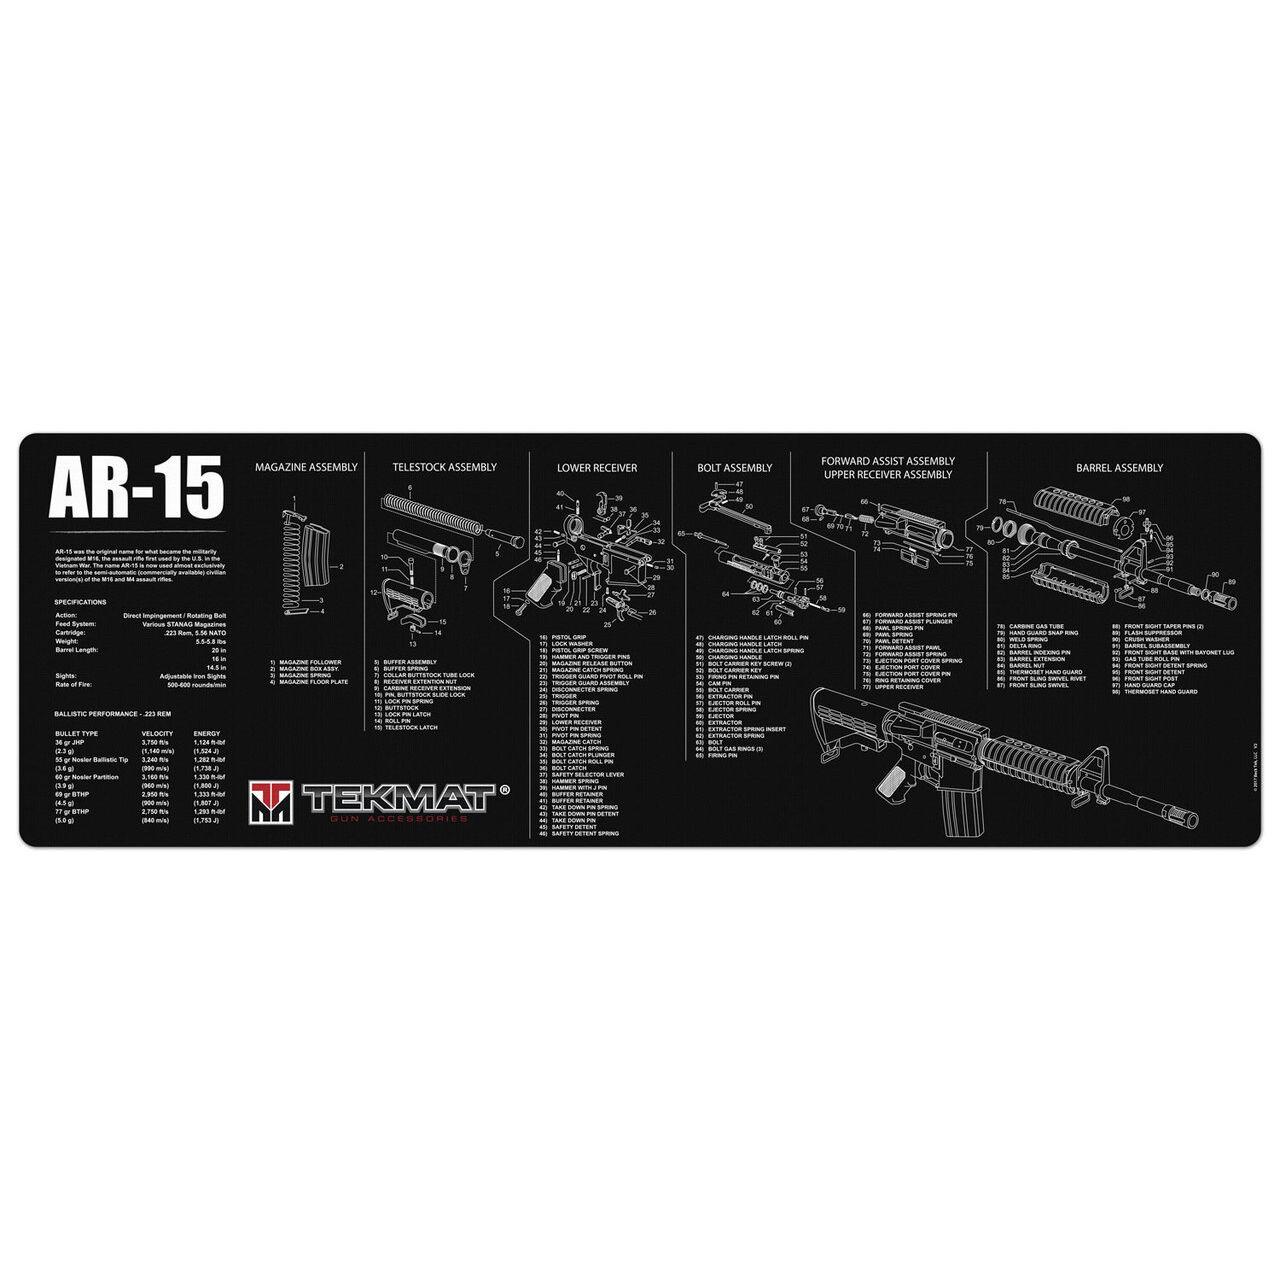 tekmat gun accessories armorer s bench tekmat ar 15 schematic mat ar 15 diagram 3 major components ar 15 diagram mat [ 1280 x 1280 Pixel ]